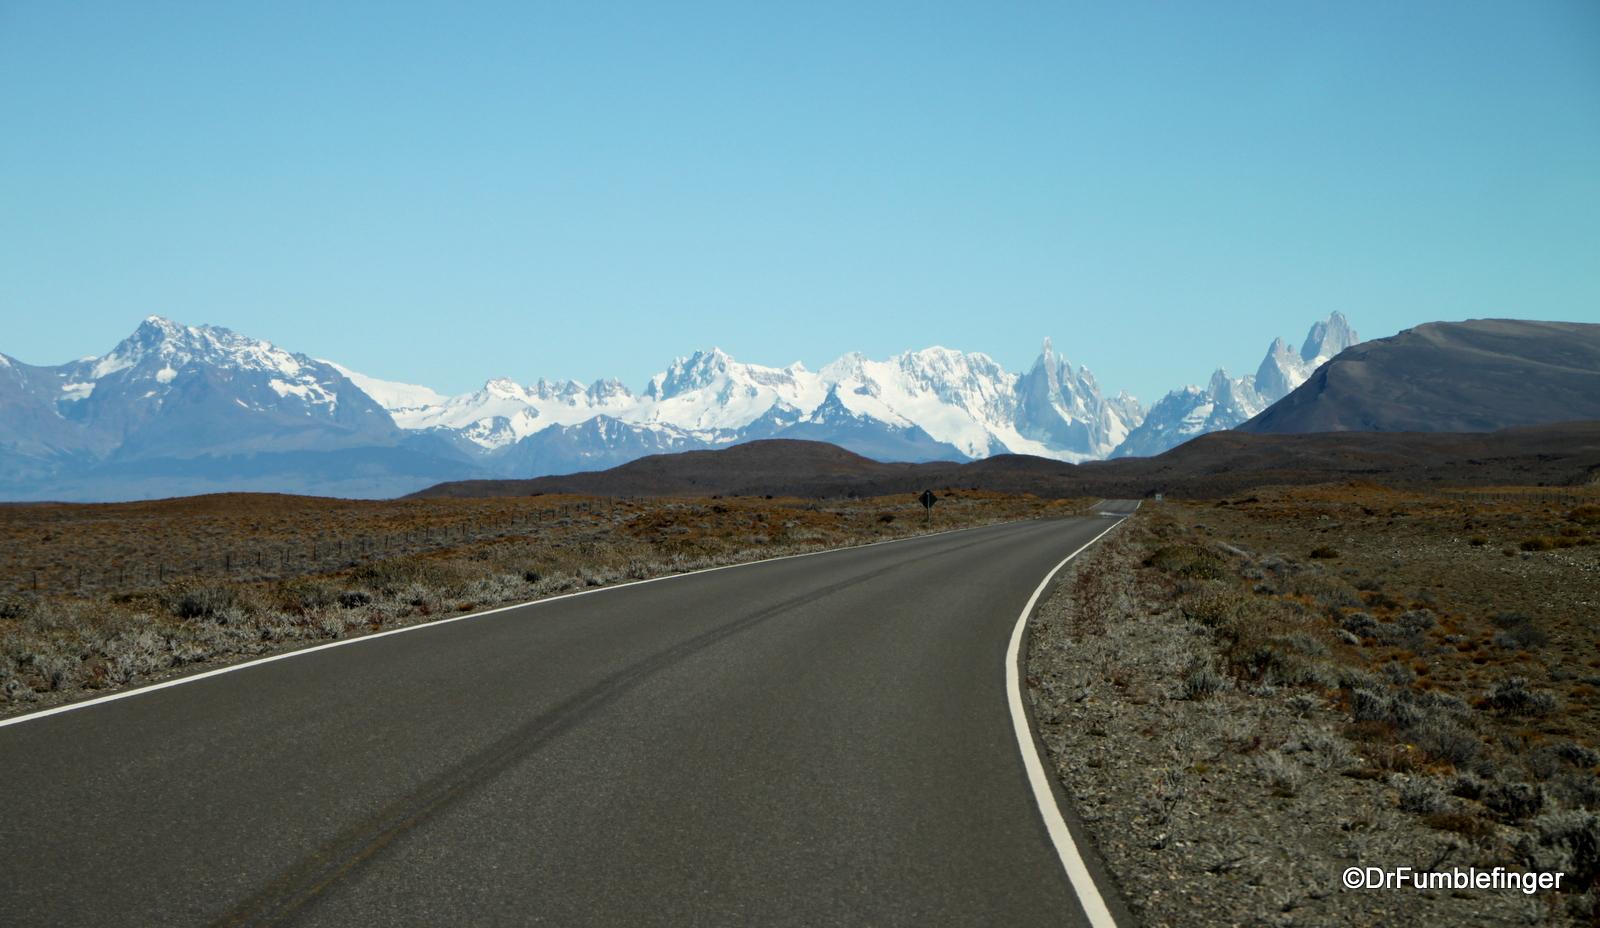 Leaving El Chalten, Argentina. Fitzroy Massif seen in a distance.